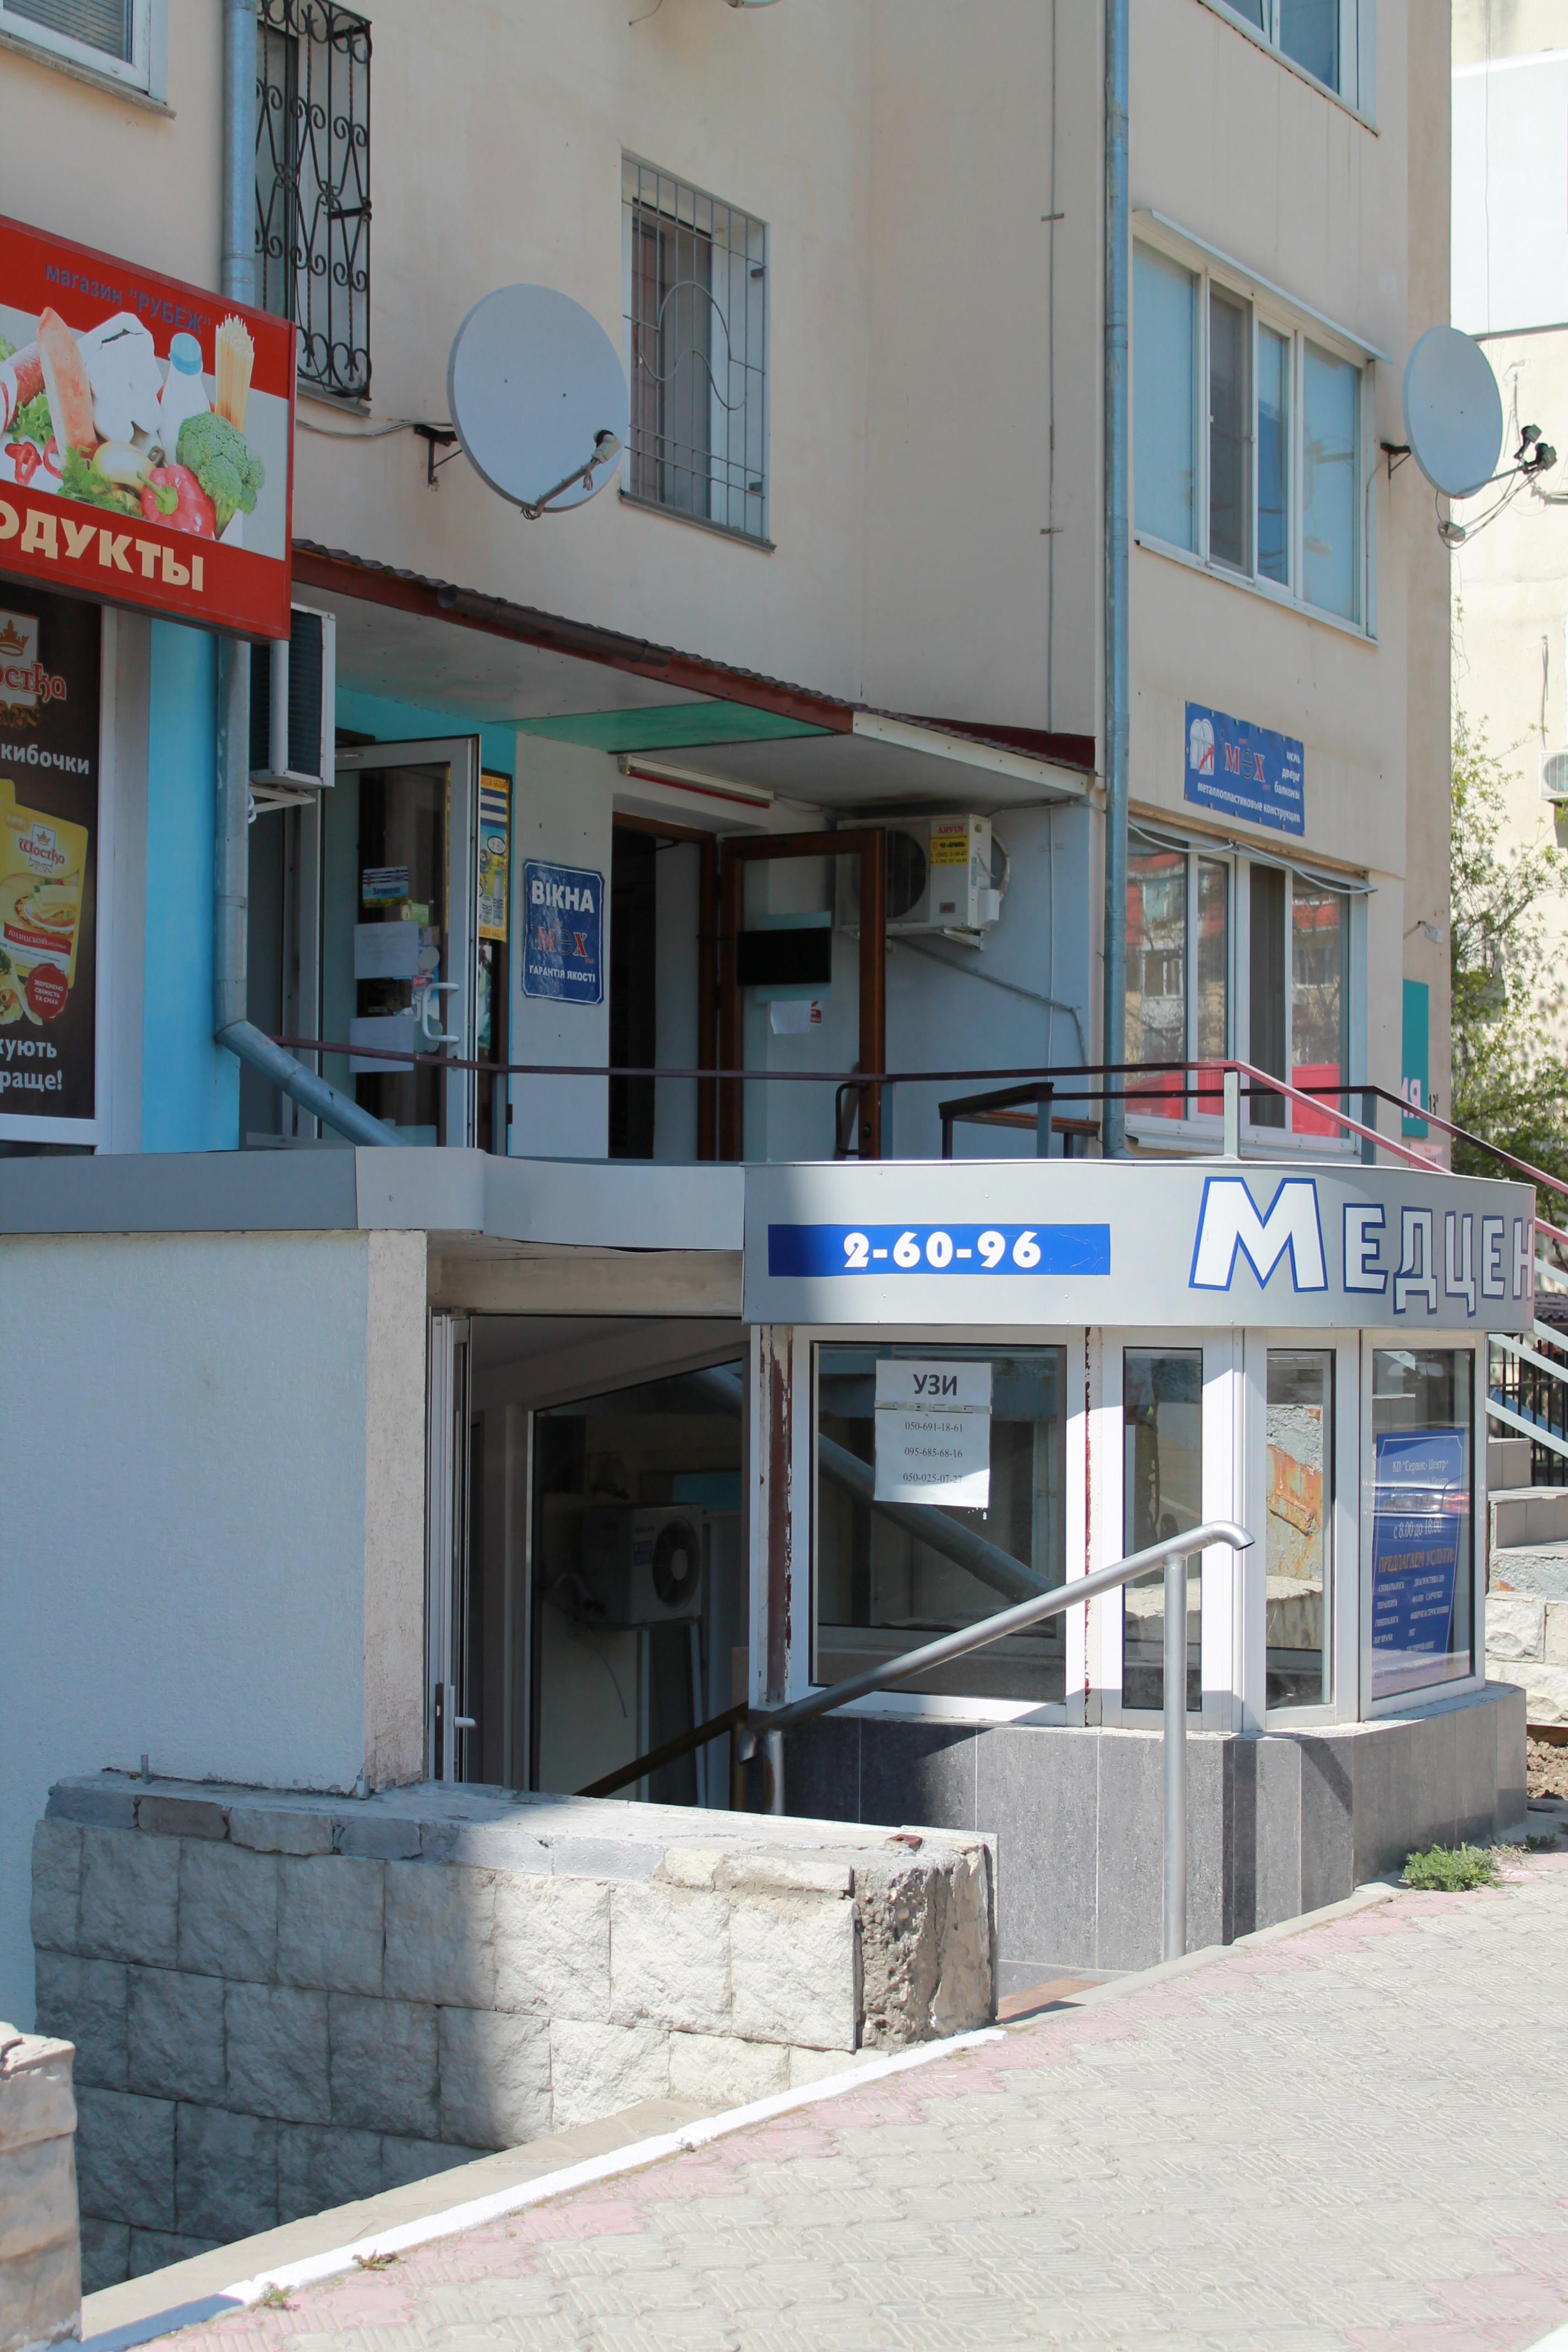 Сервис-центр, КП, медицинский центр фасад